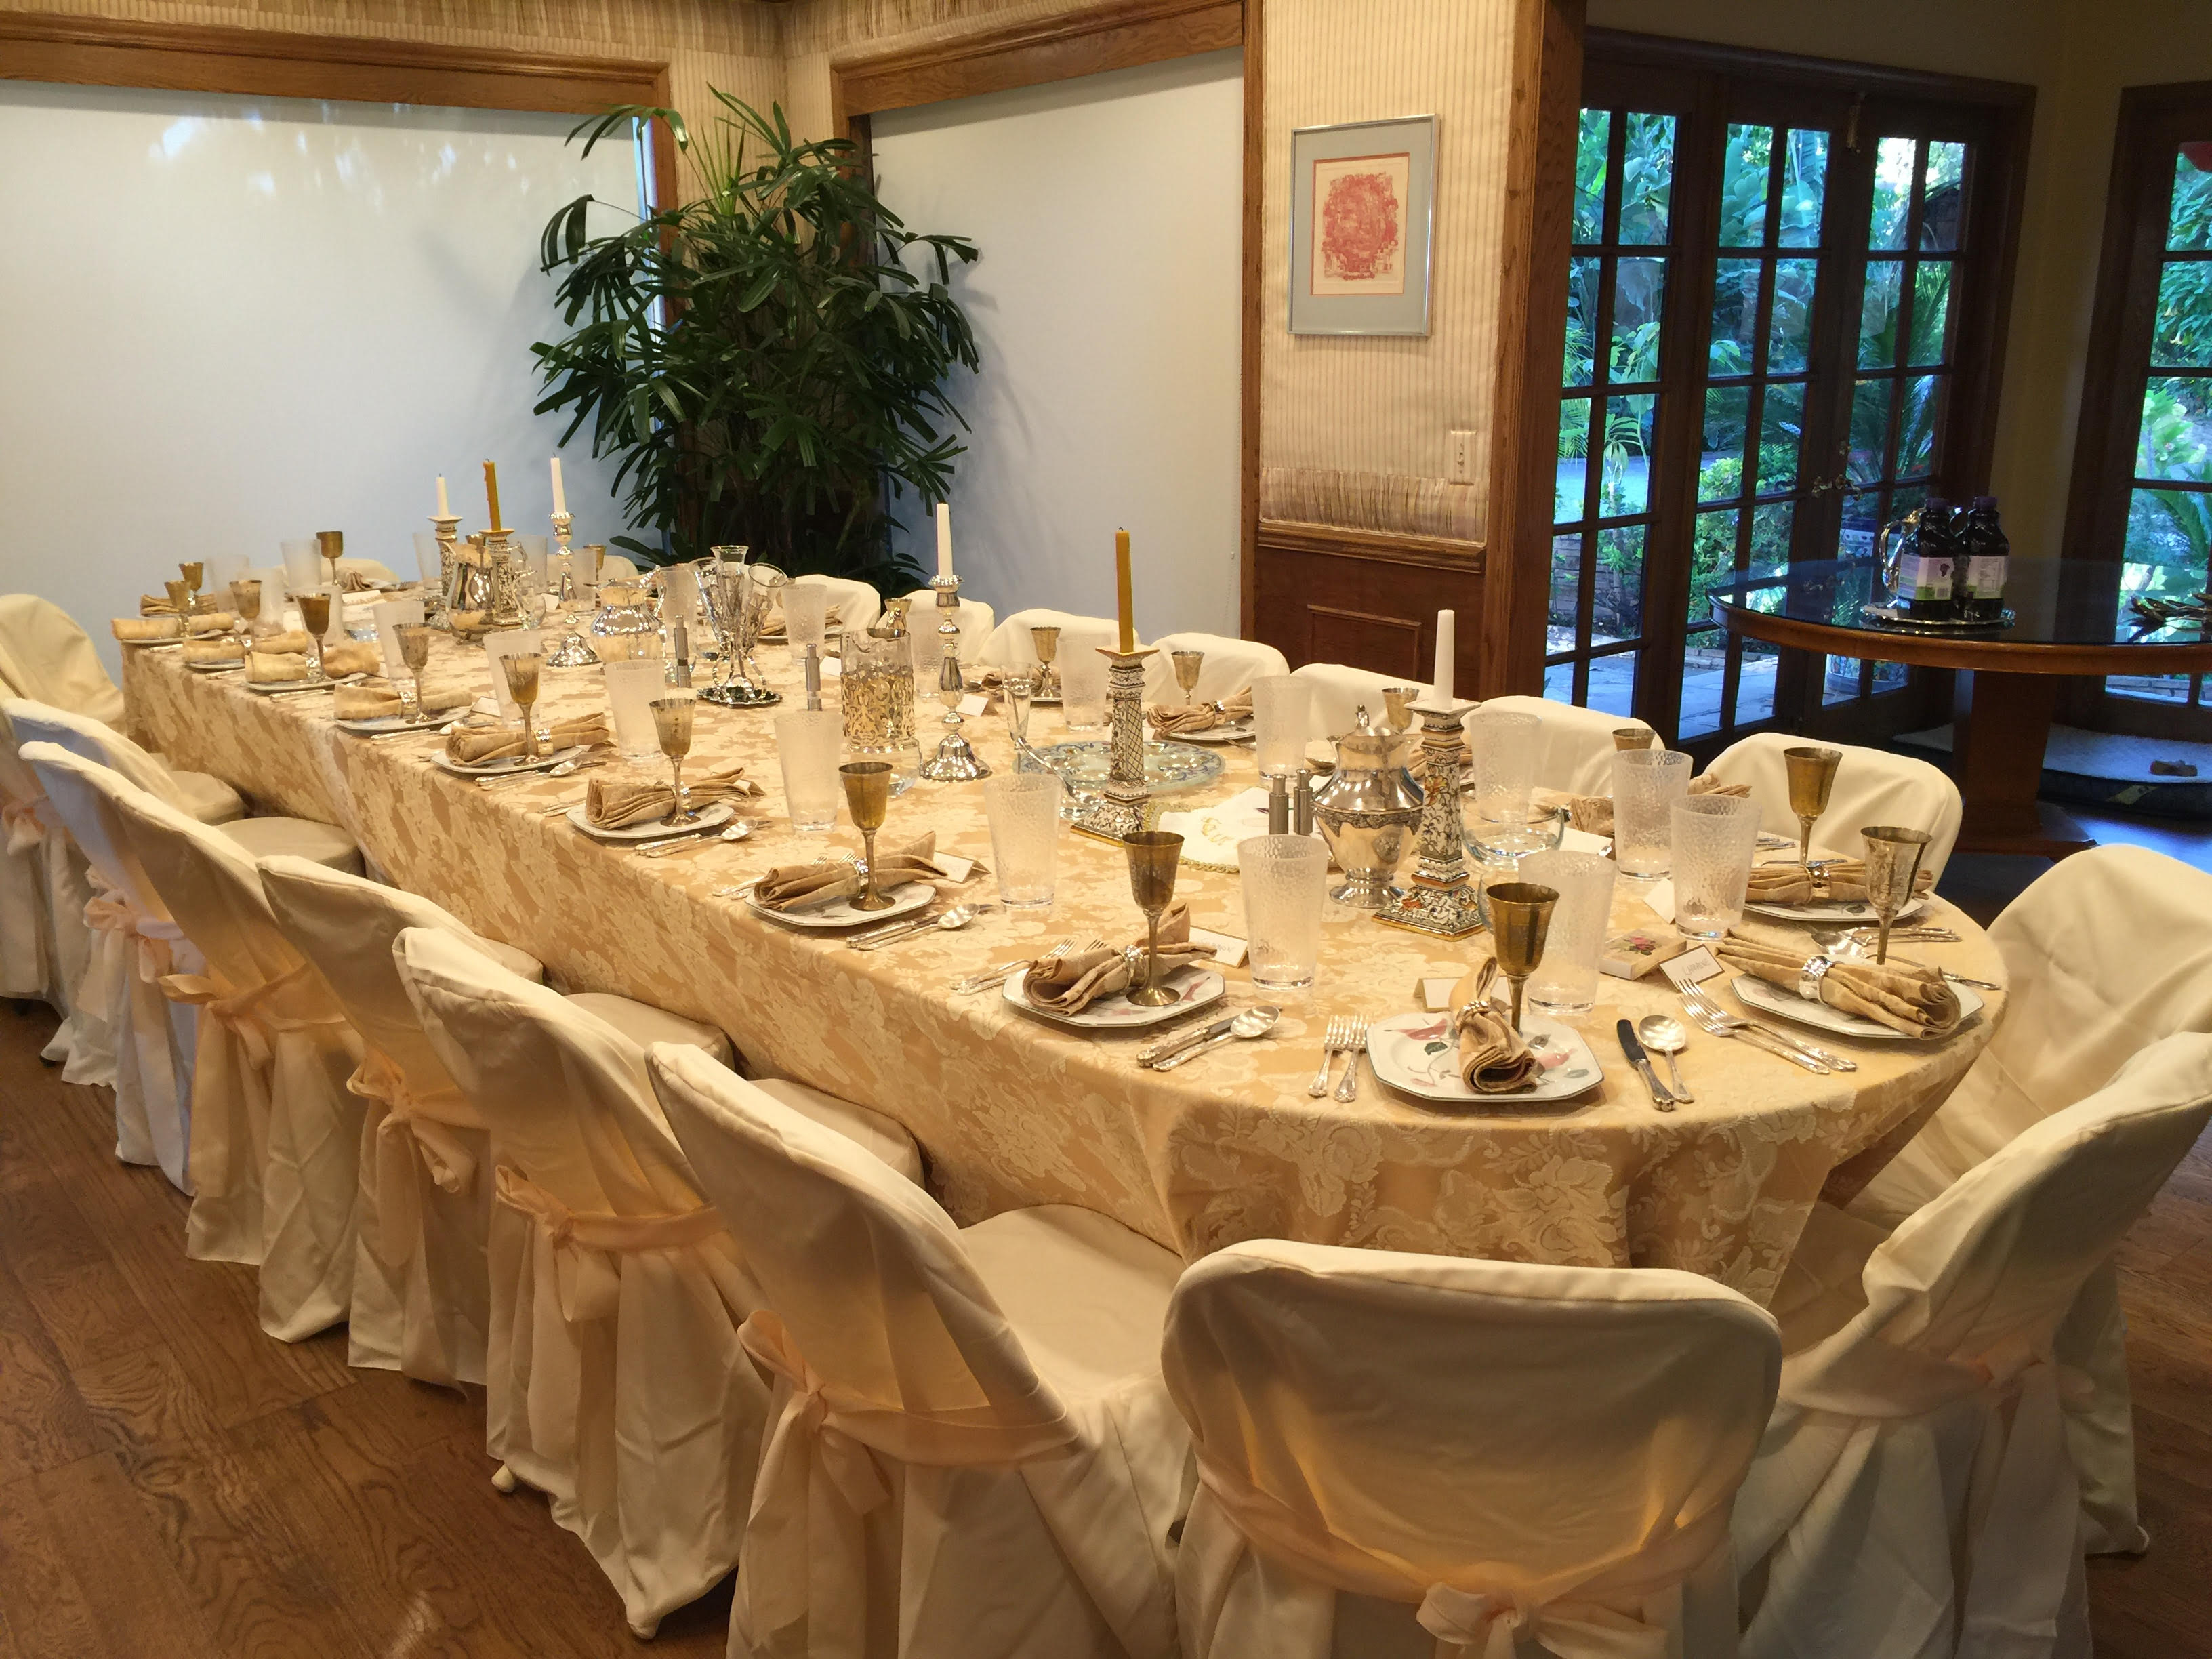 Seder table 2016 At Little Farm